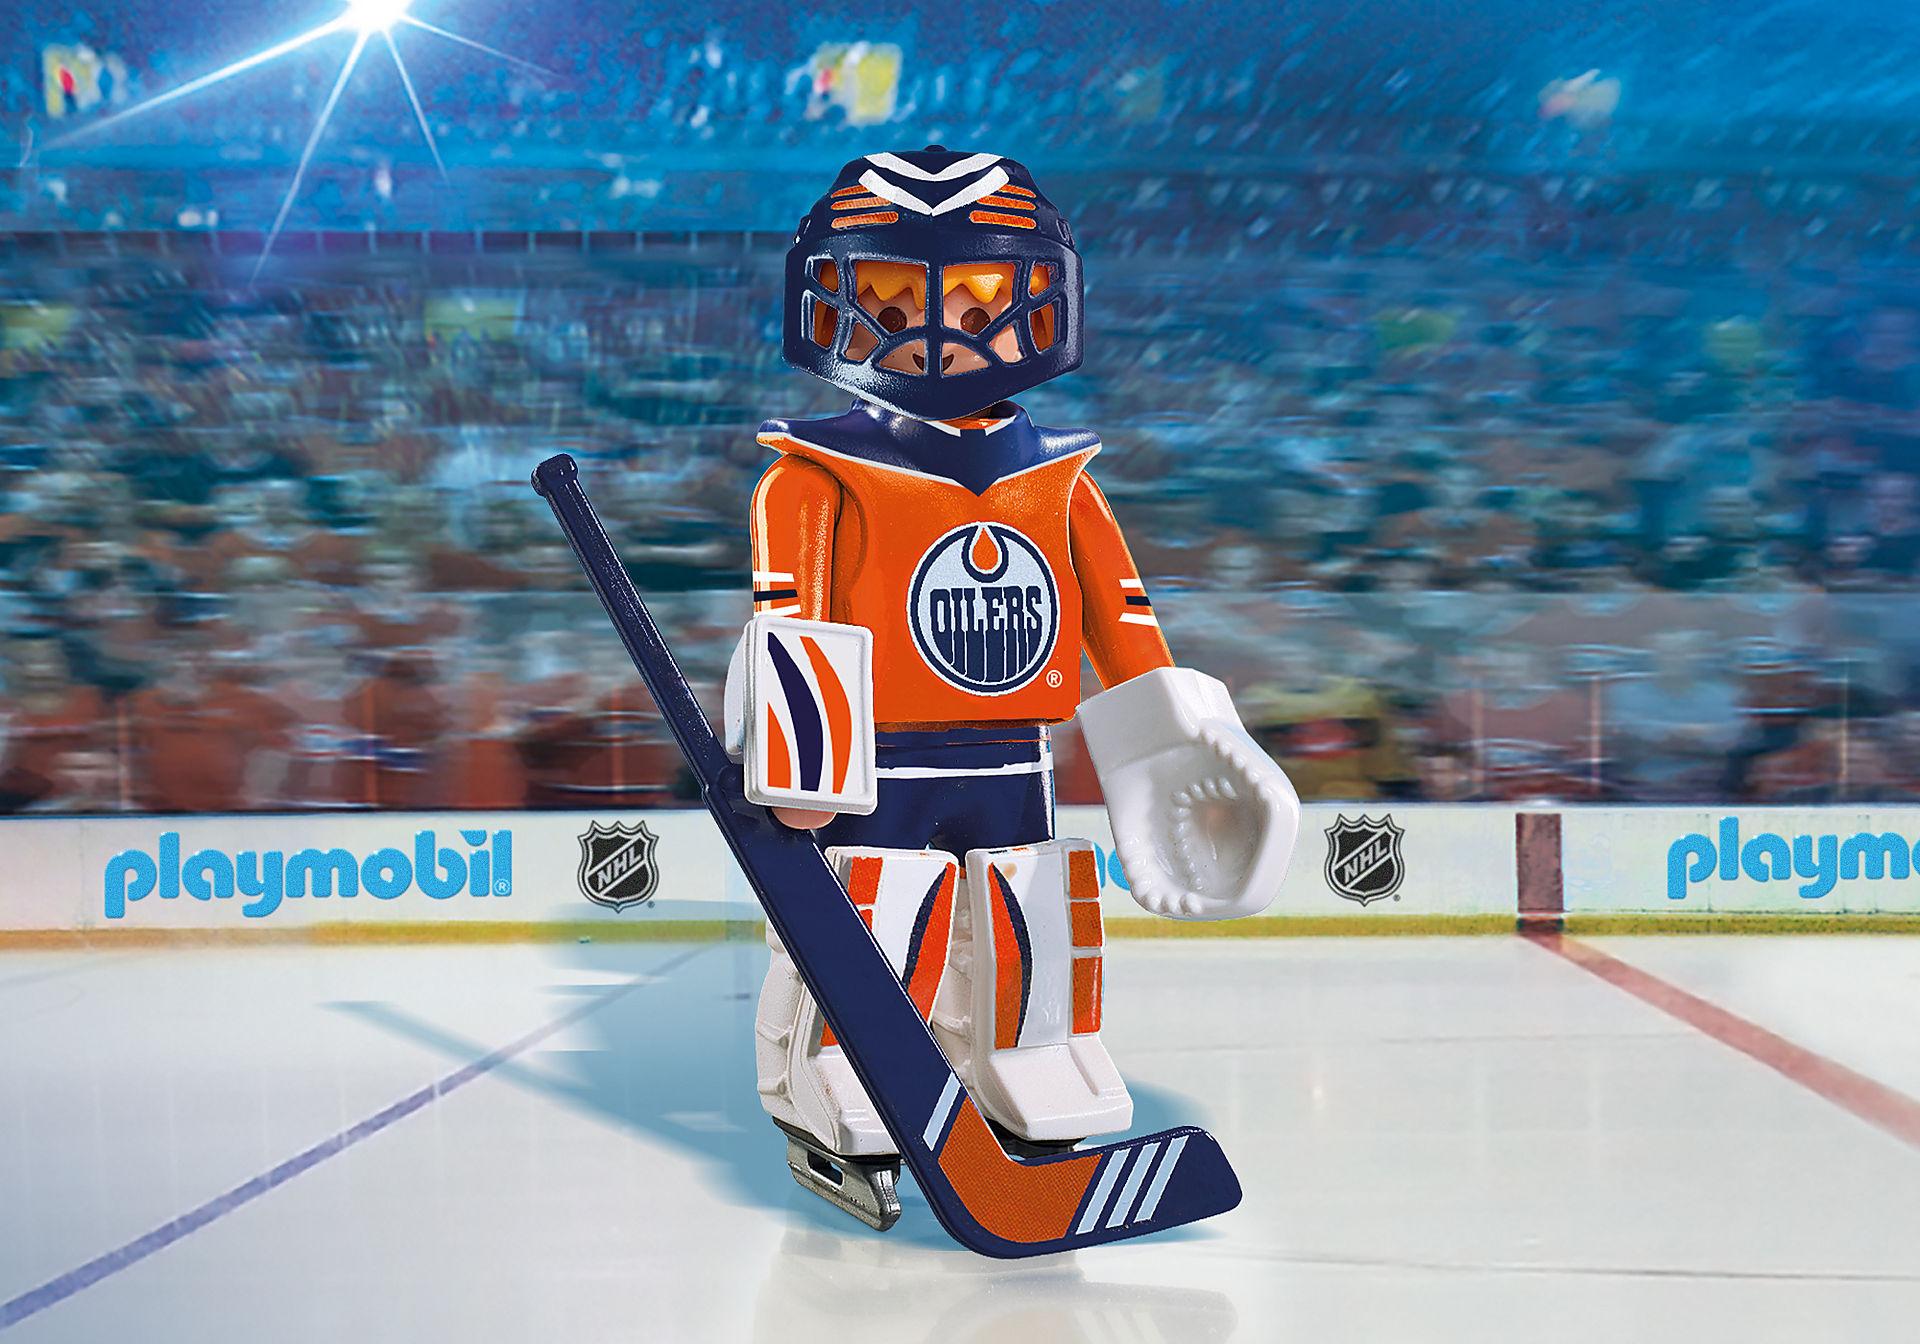 9022 NHL™ Edmonton Oilers™ Goalie zoom image1